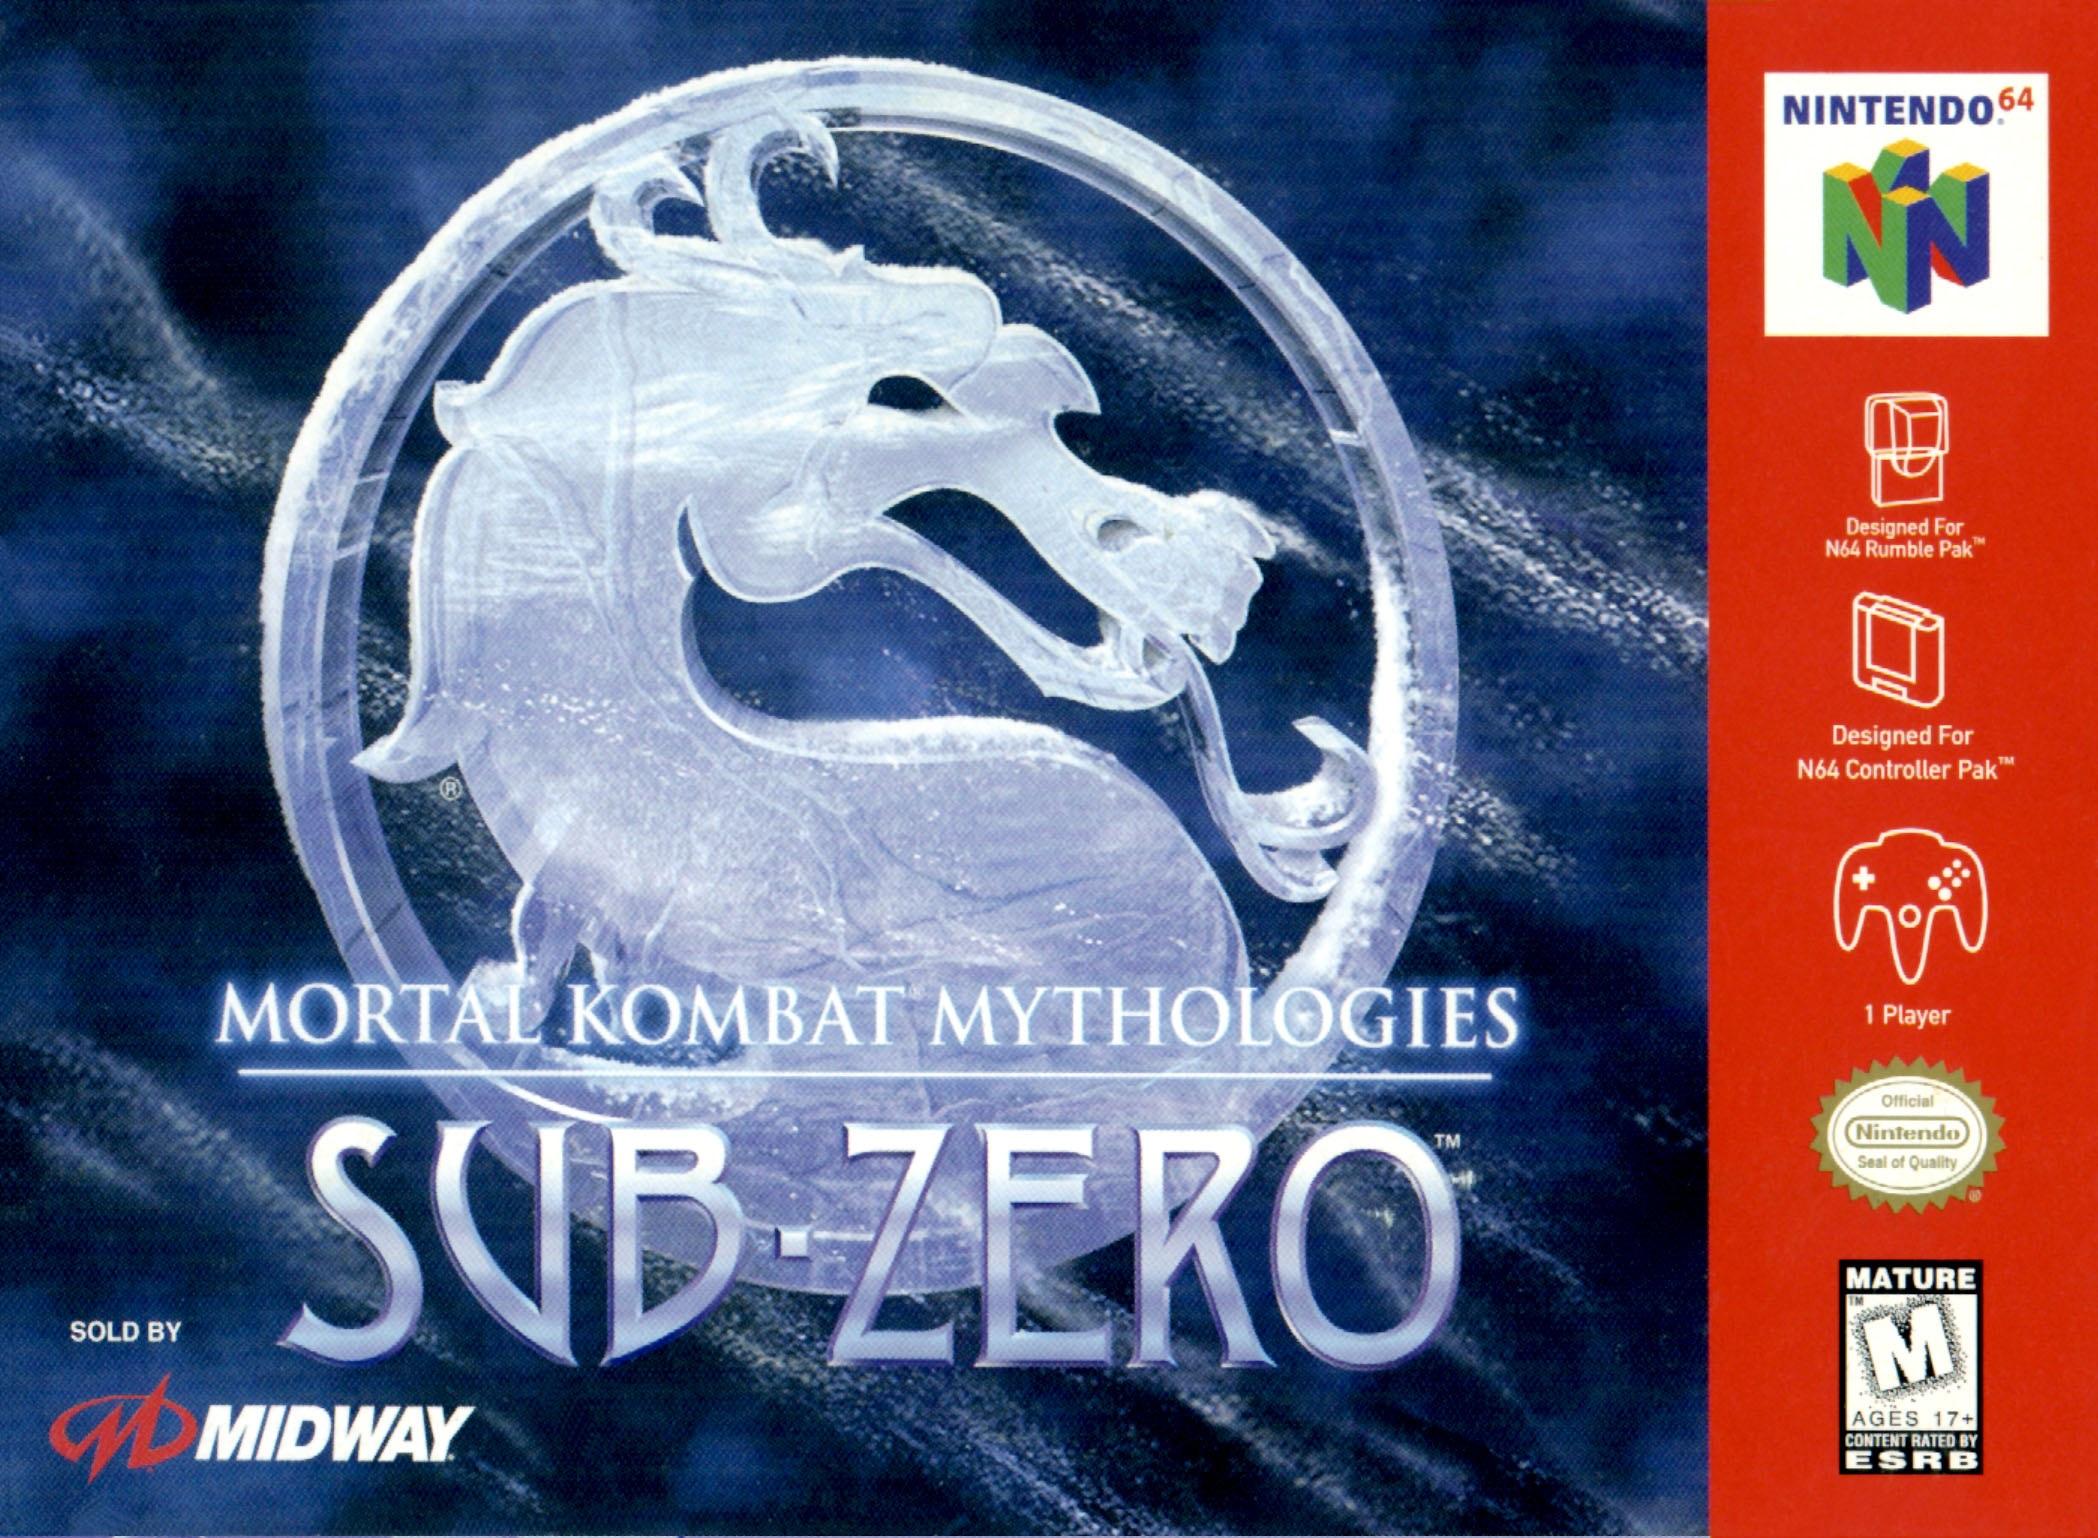 n64_mortal_kombat_mythologies_subzero_p_cllwy0.jpg